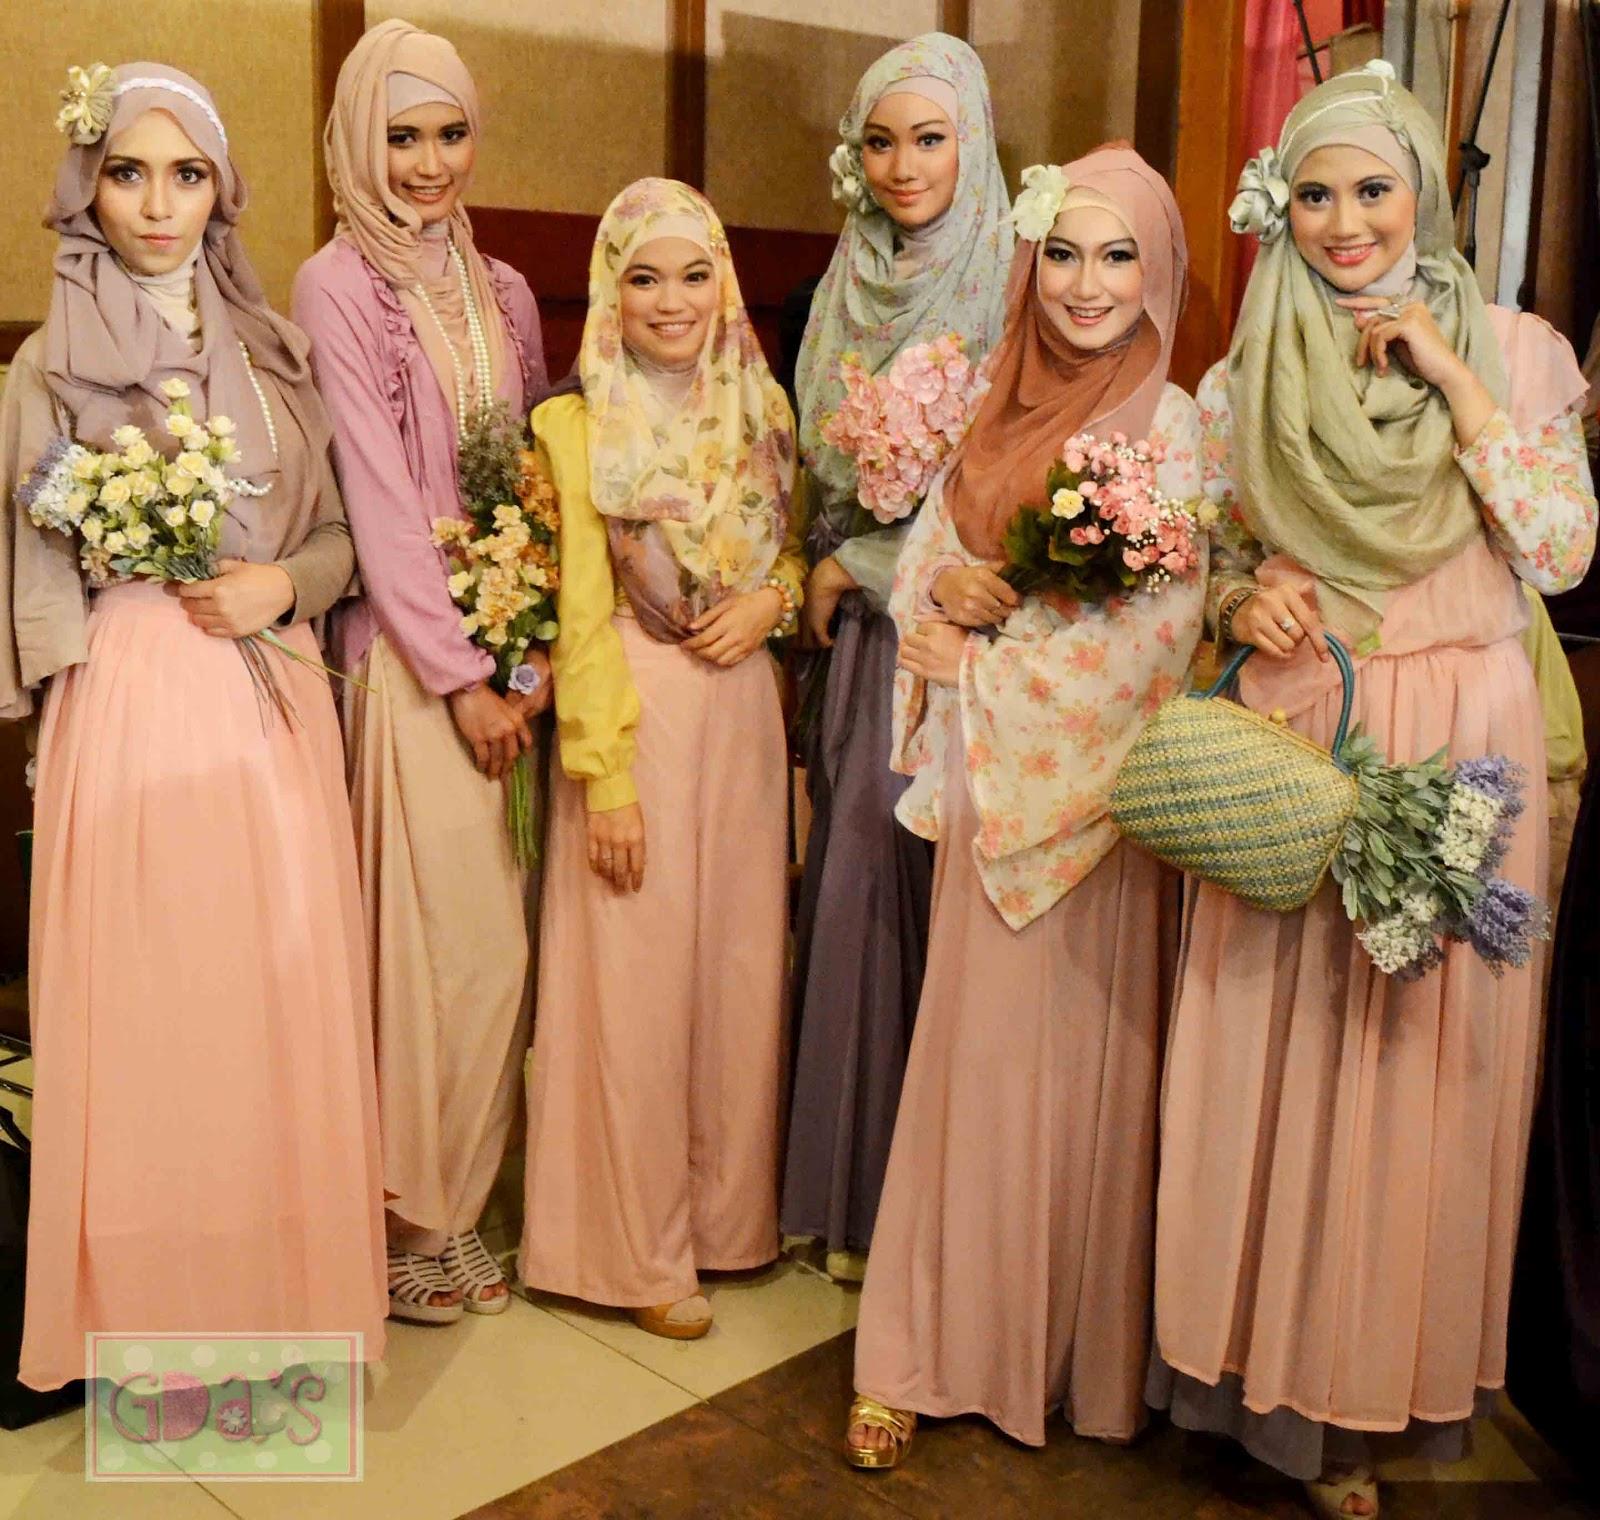 82 Gambar Keren Tutorial Hijab Untuk Fashion Show Terbaru